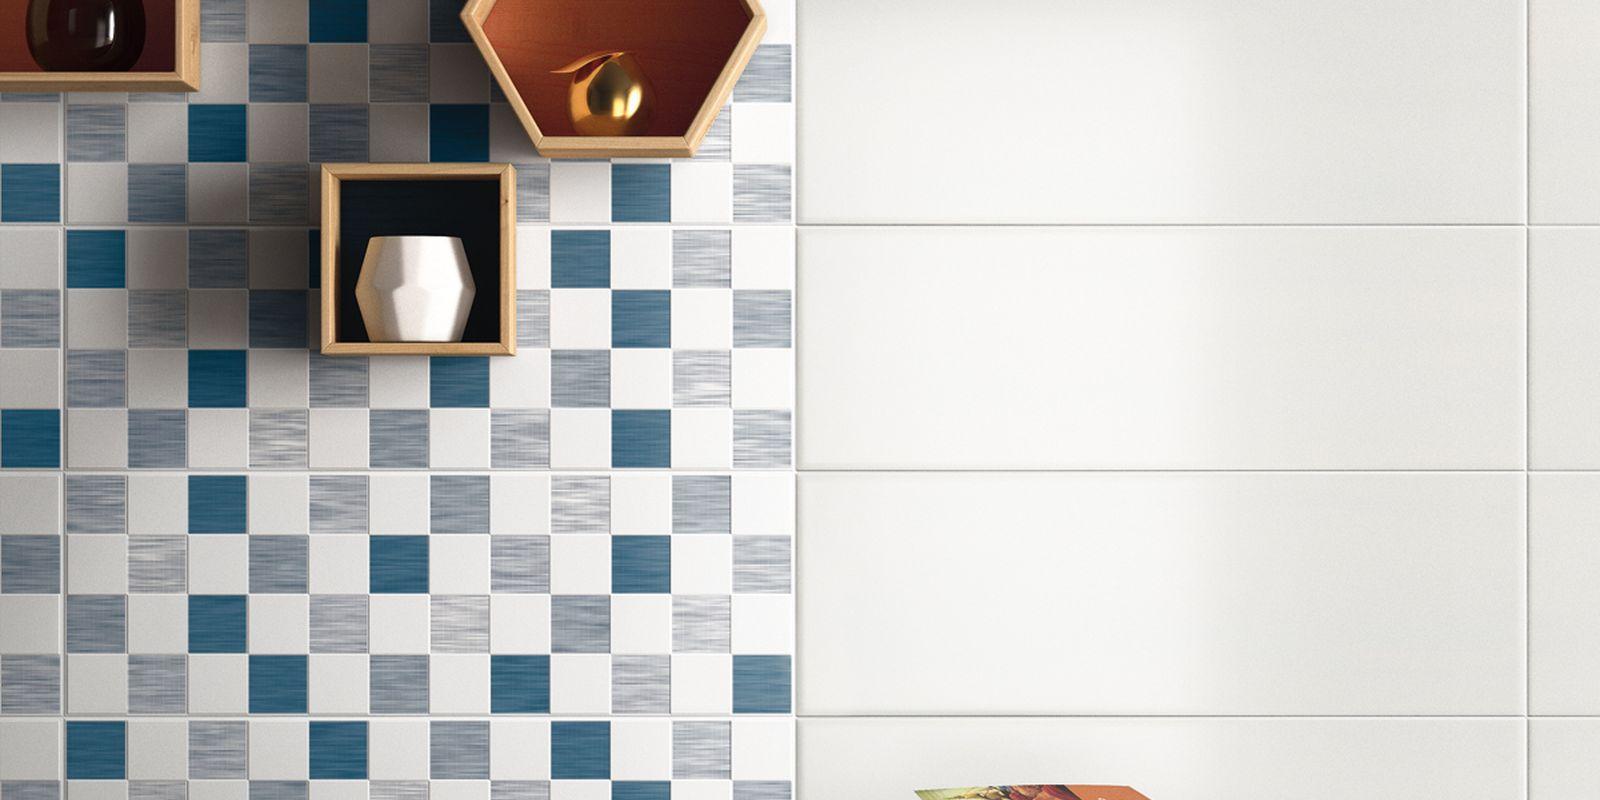 Indoor Tile Wall Ceramic Plain